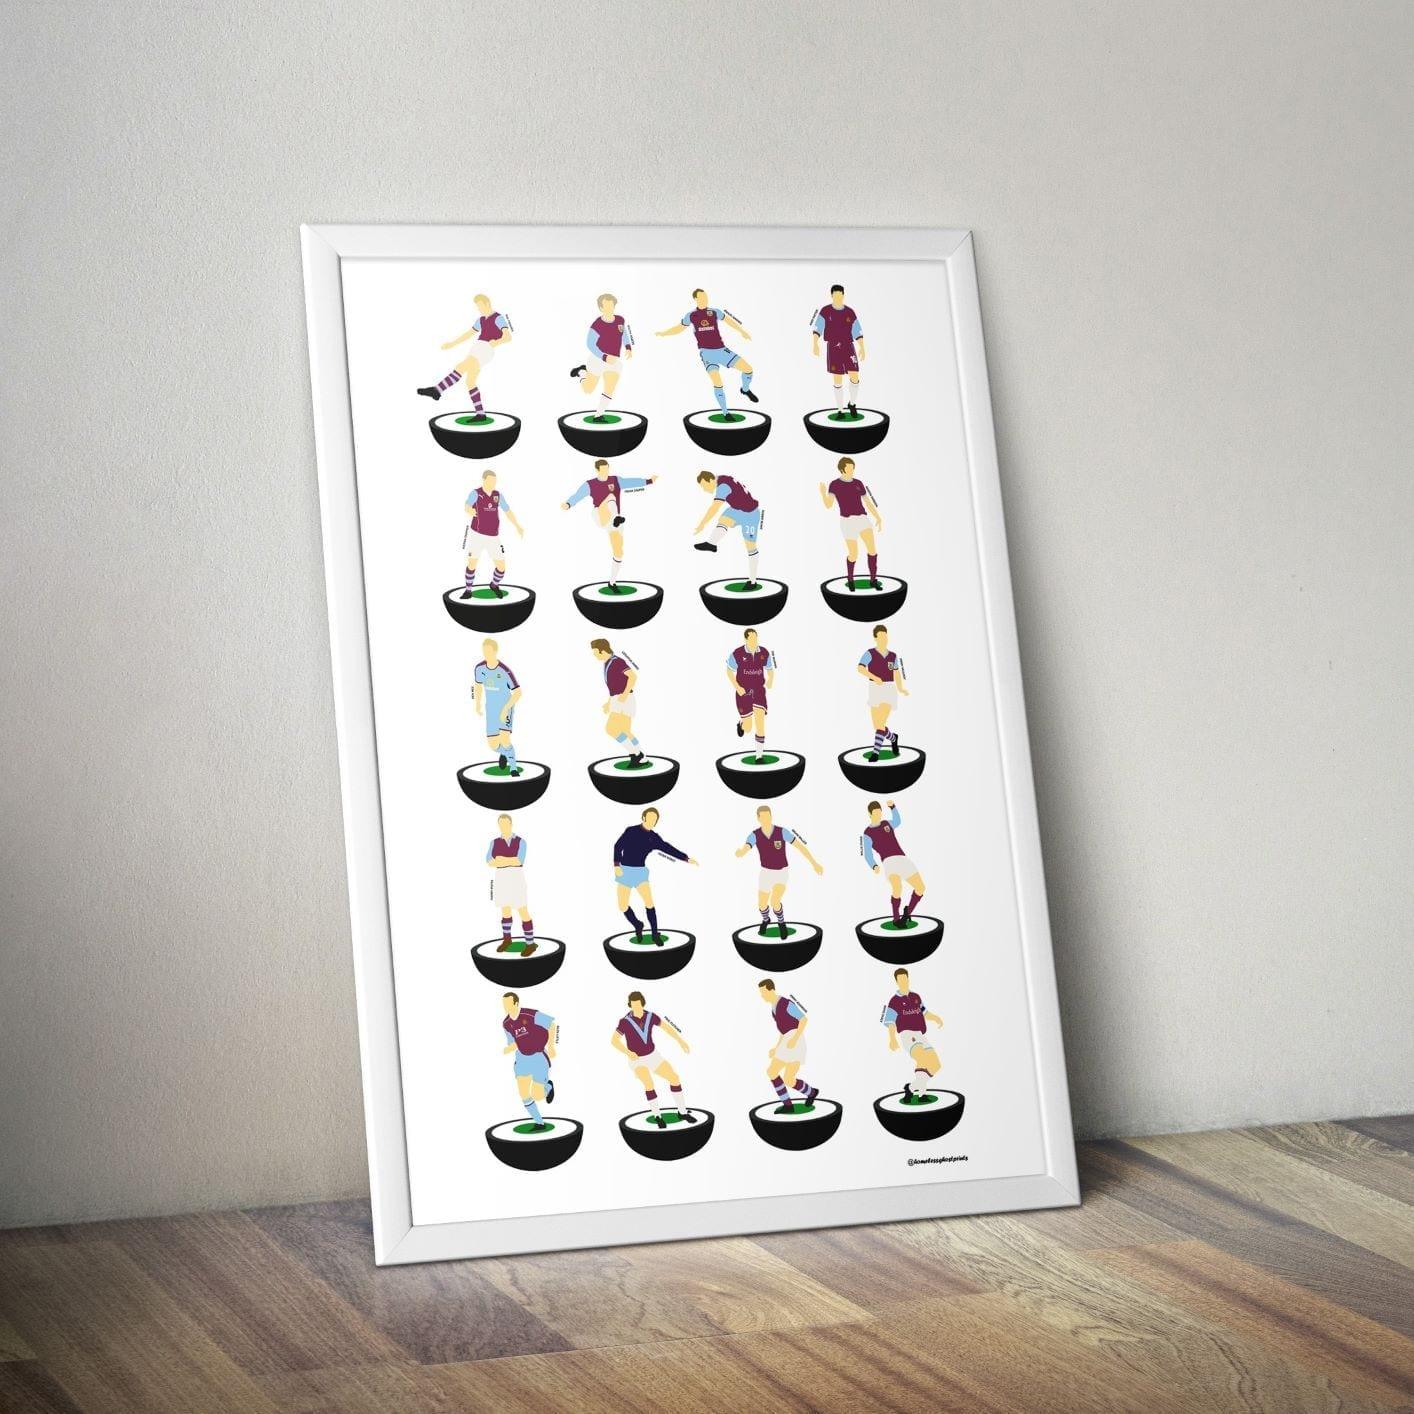 Burnley Subbuteo Print – Unframed